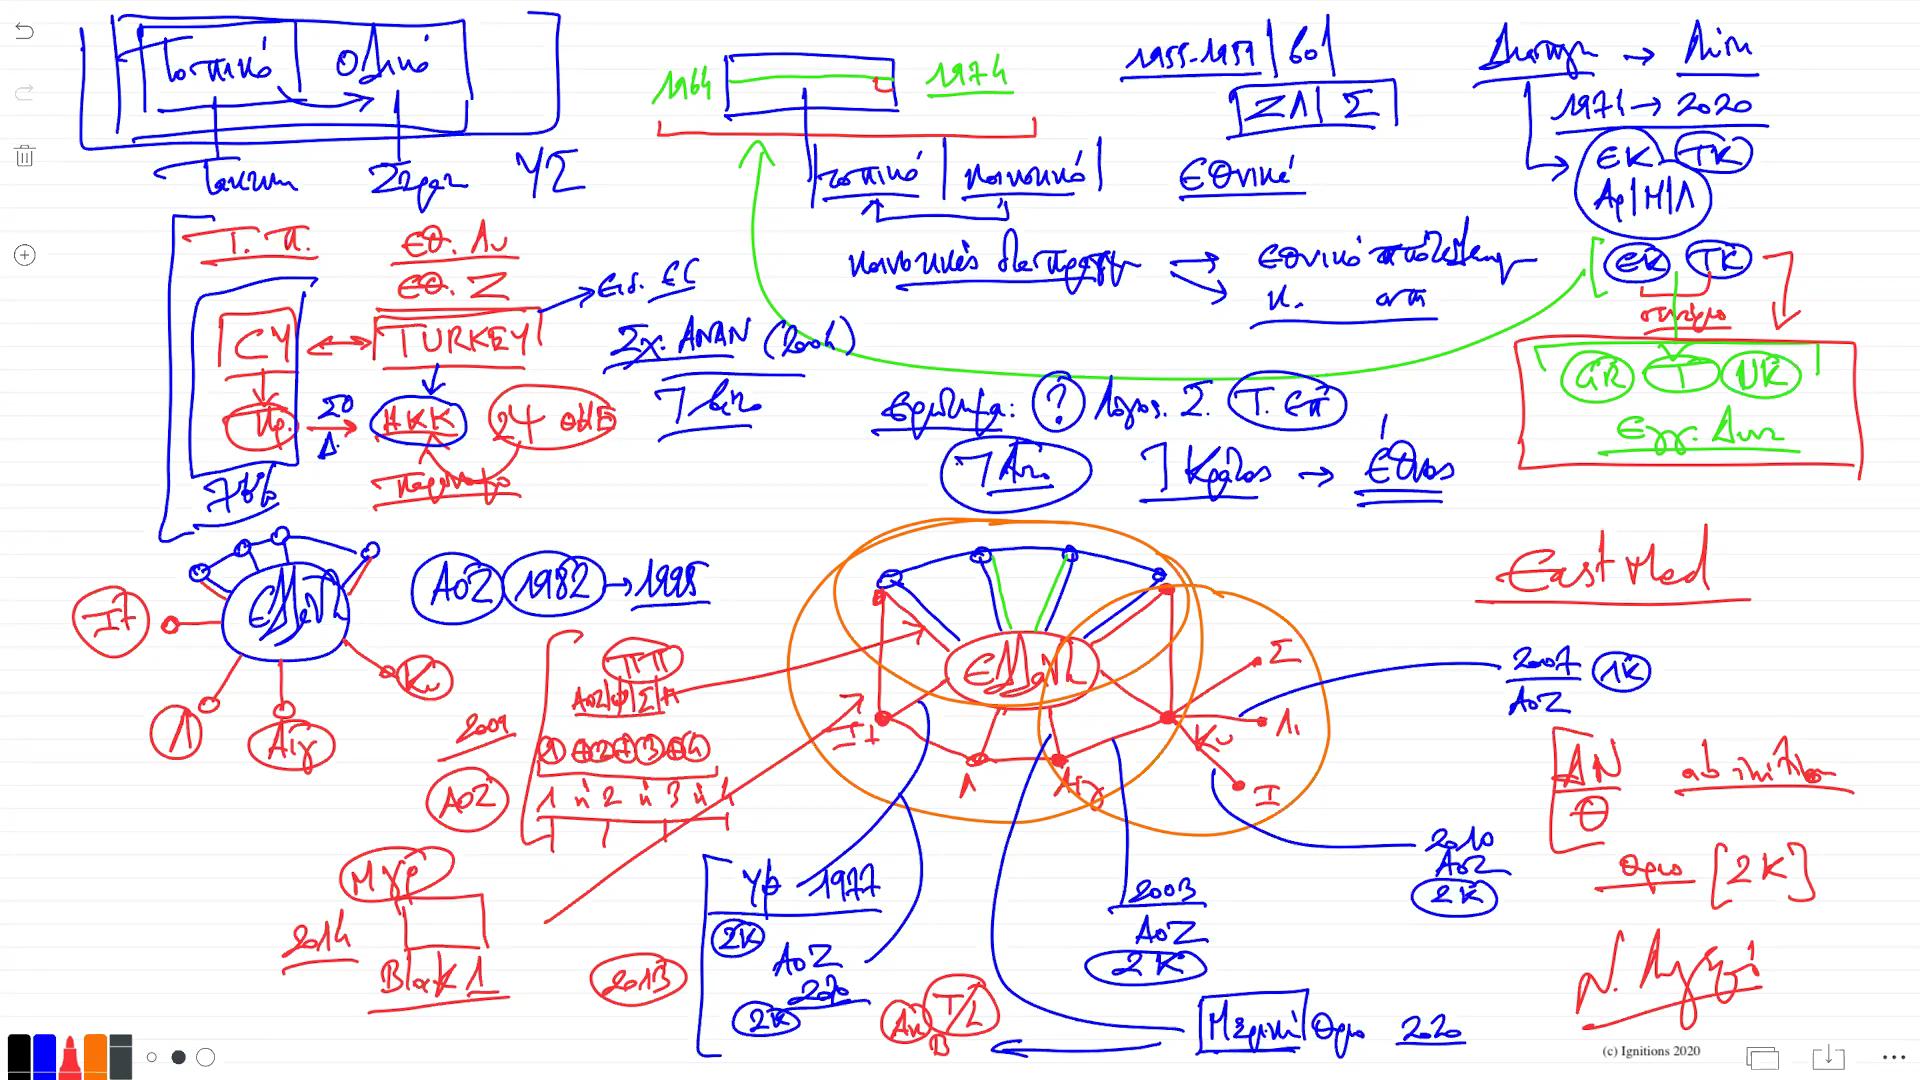 56463 - VIII - e-Διάλεξη: Ελληνική Γεωστρατηγική II. (Dessin)